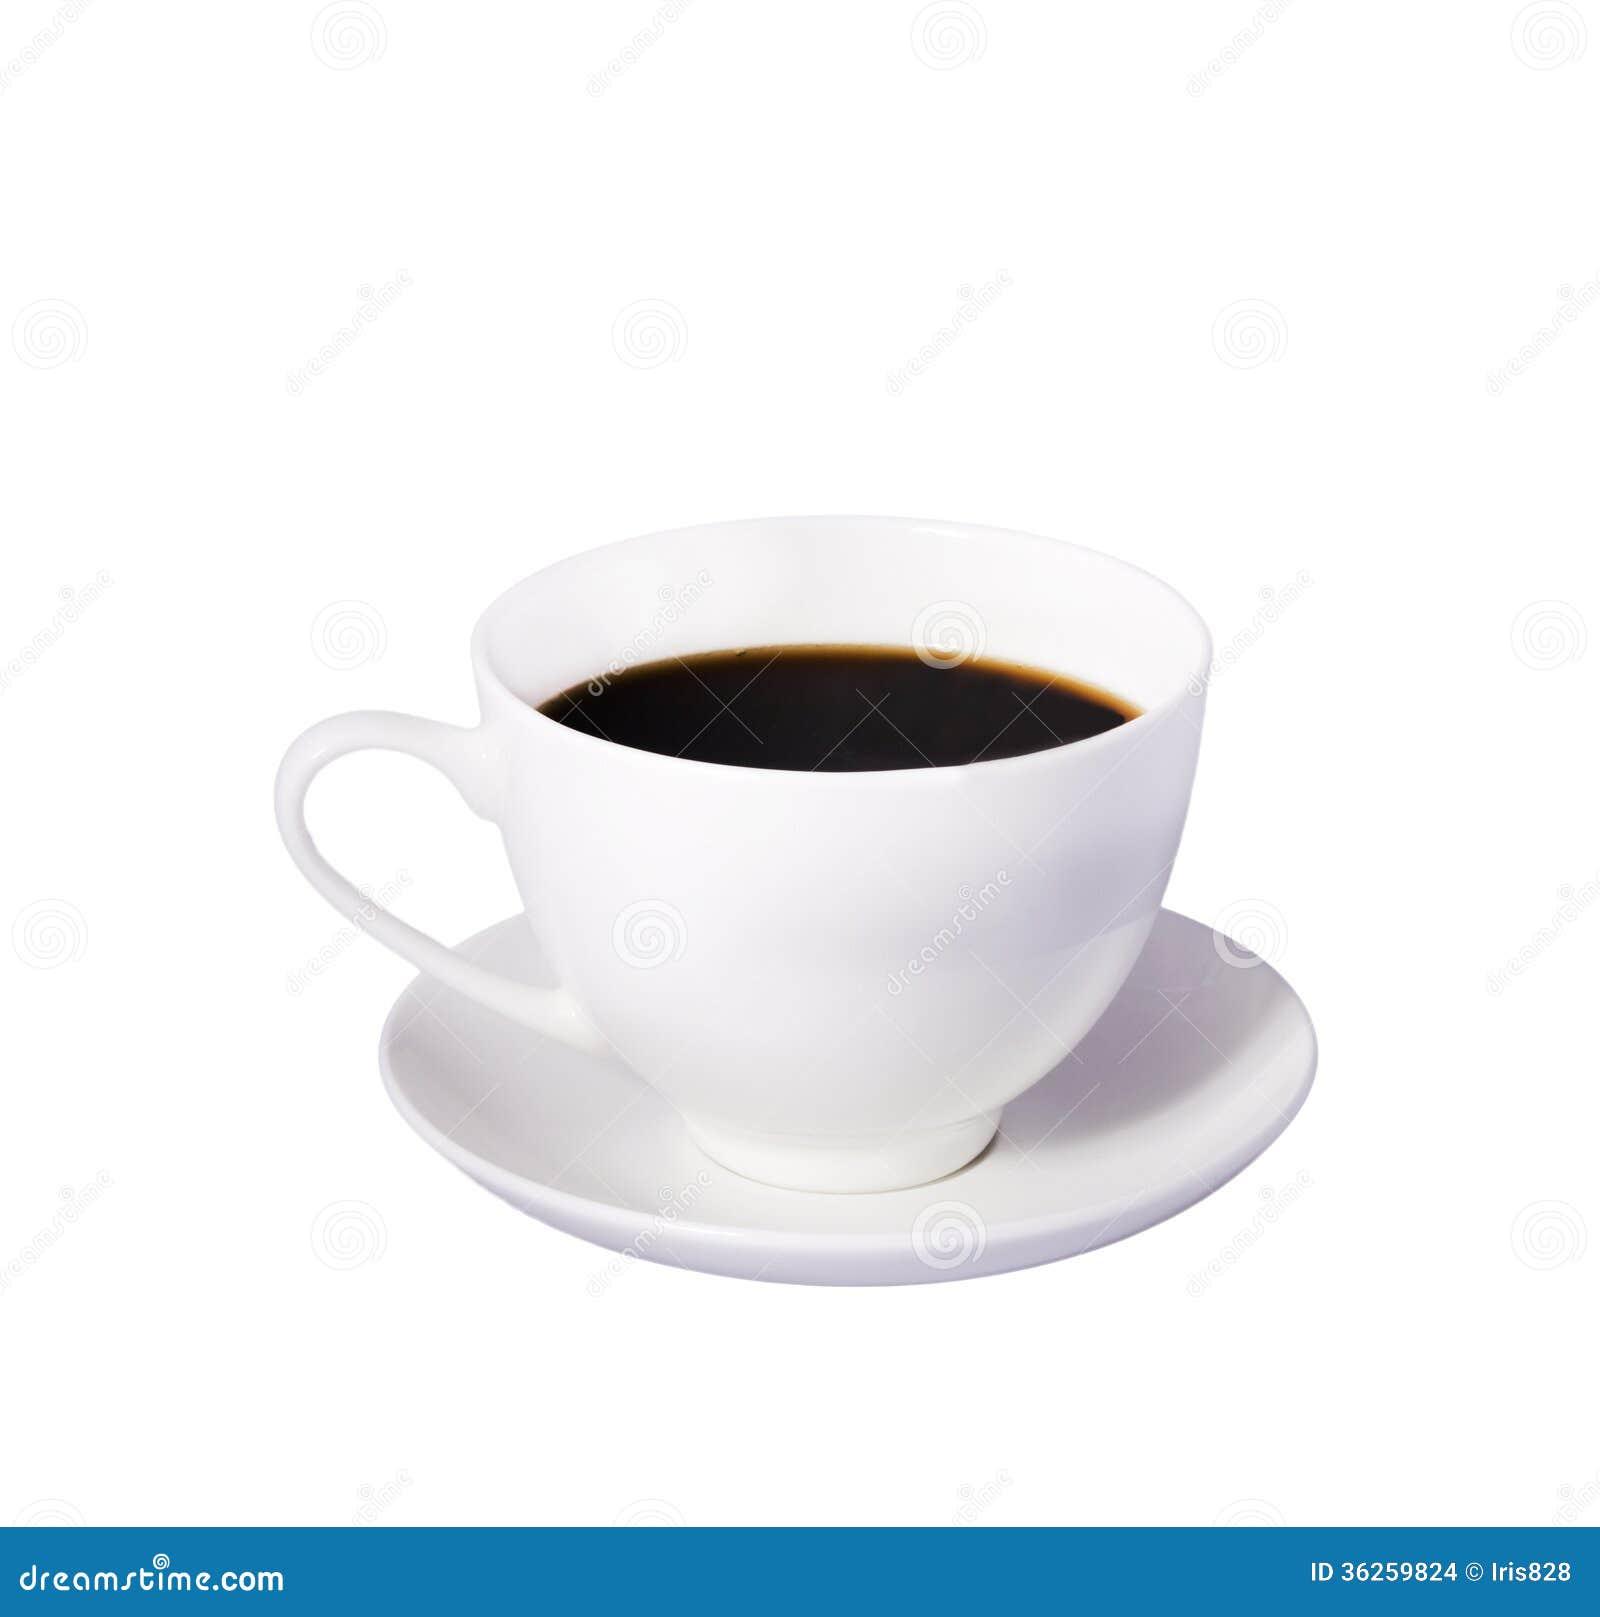 hot coffee white background - photo #16